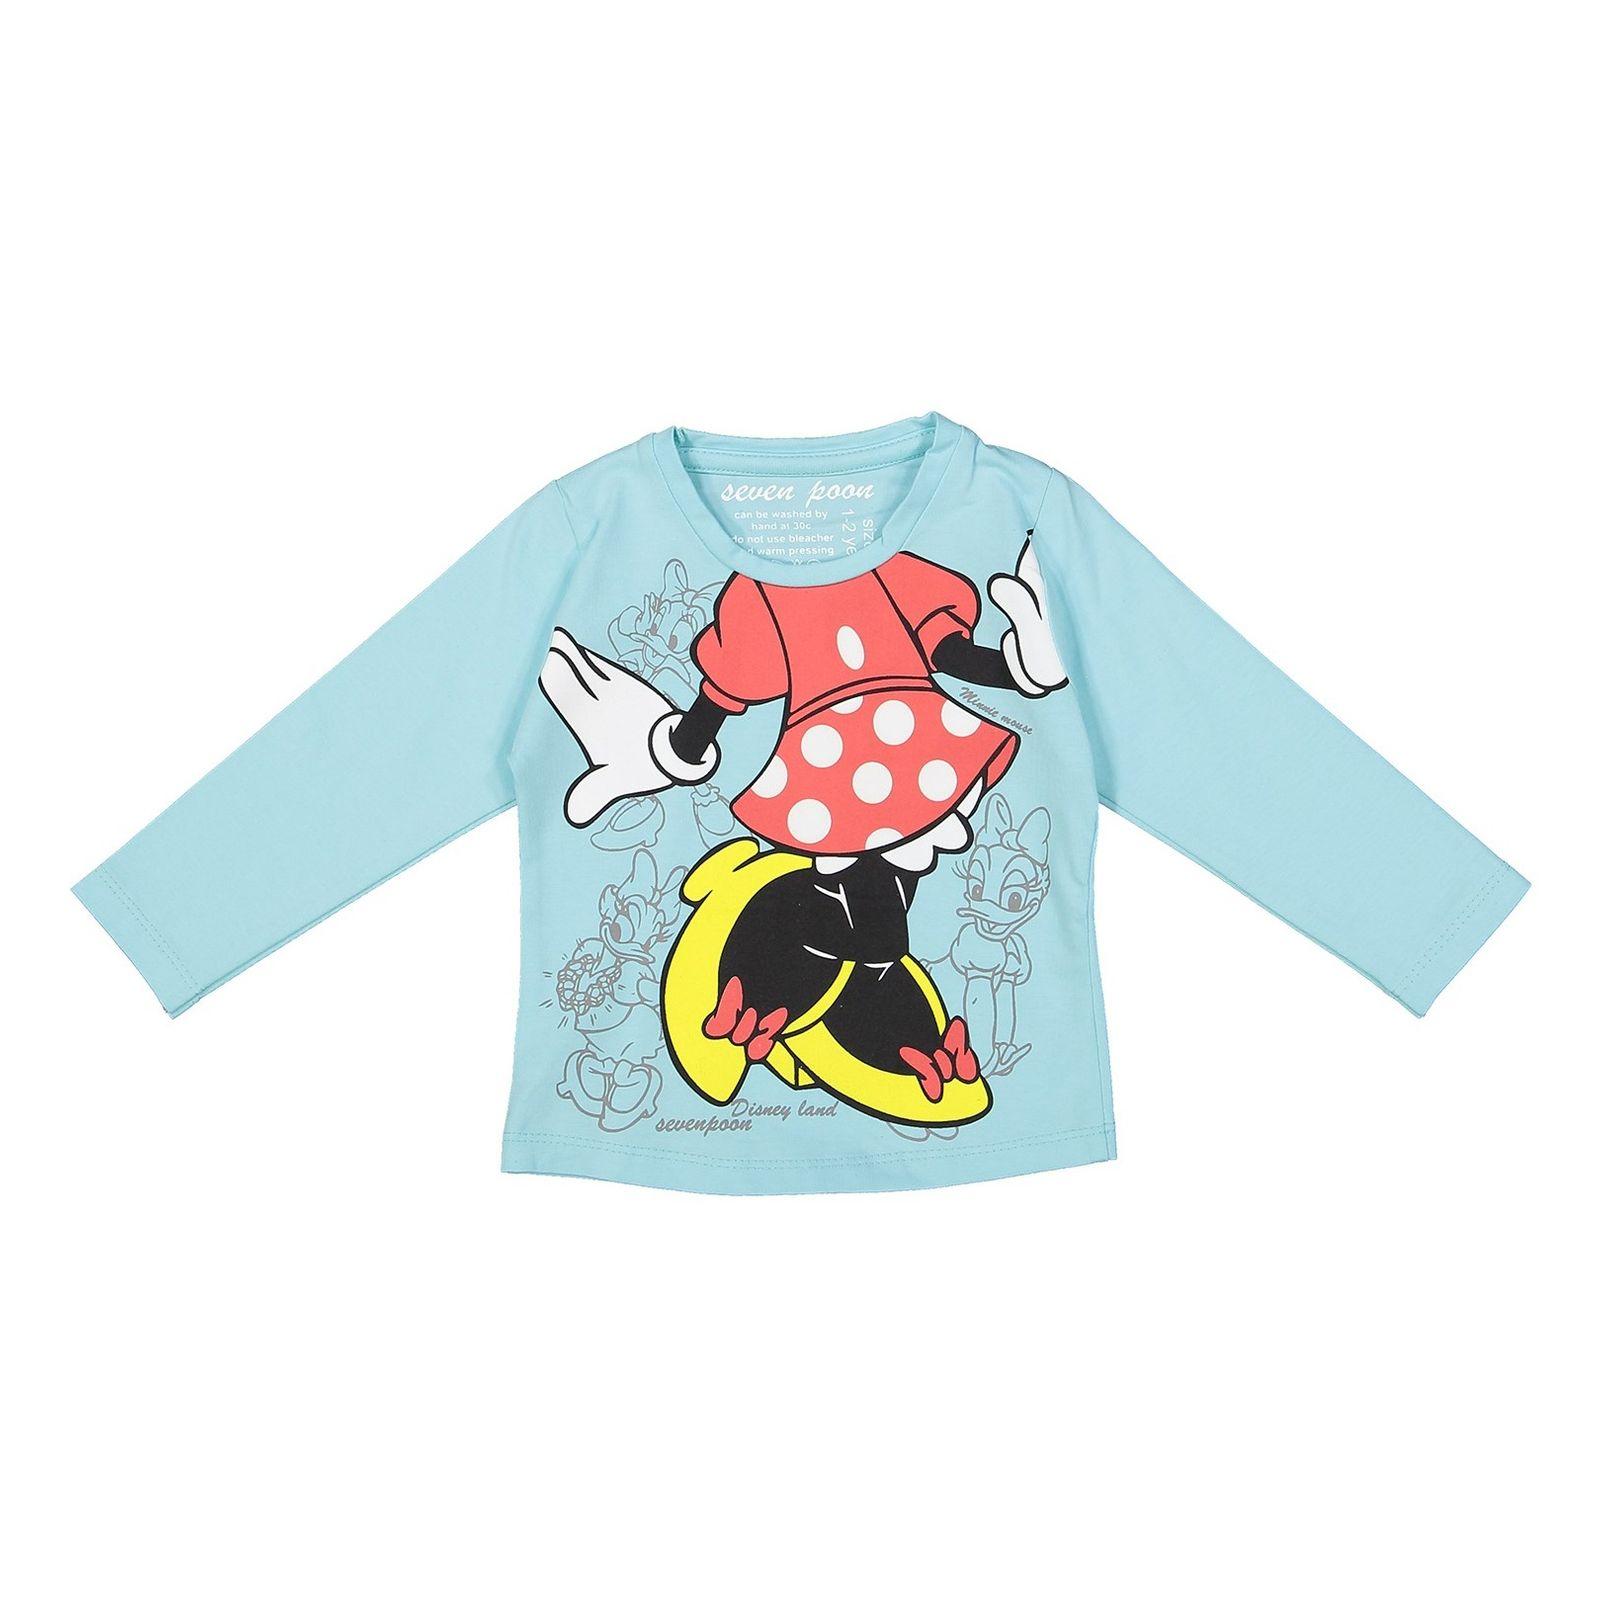 تی شرت نخی یقه گرد دخترانه - سون پون - آبي - 1